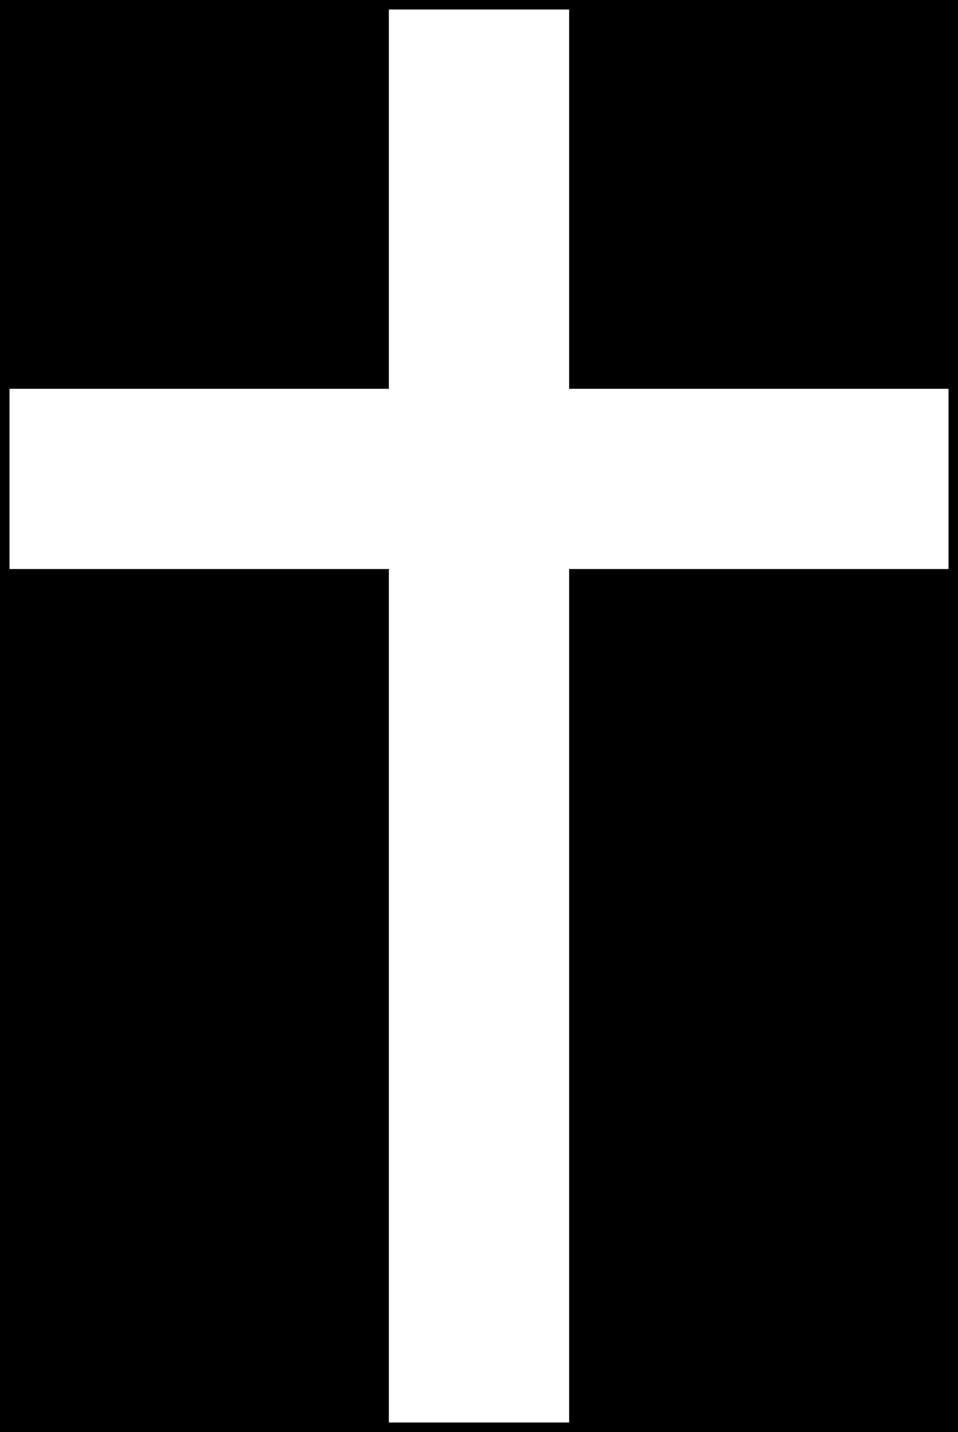 Illustration of a cross